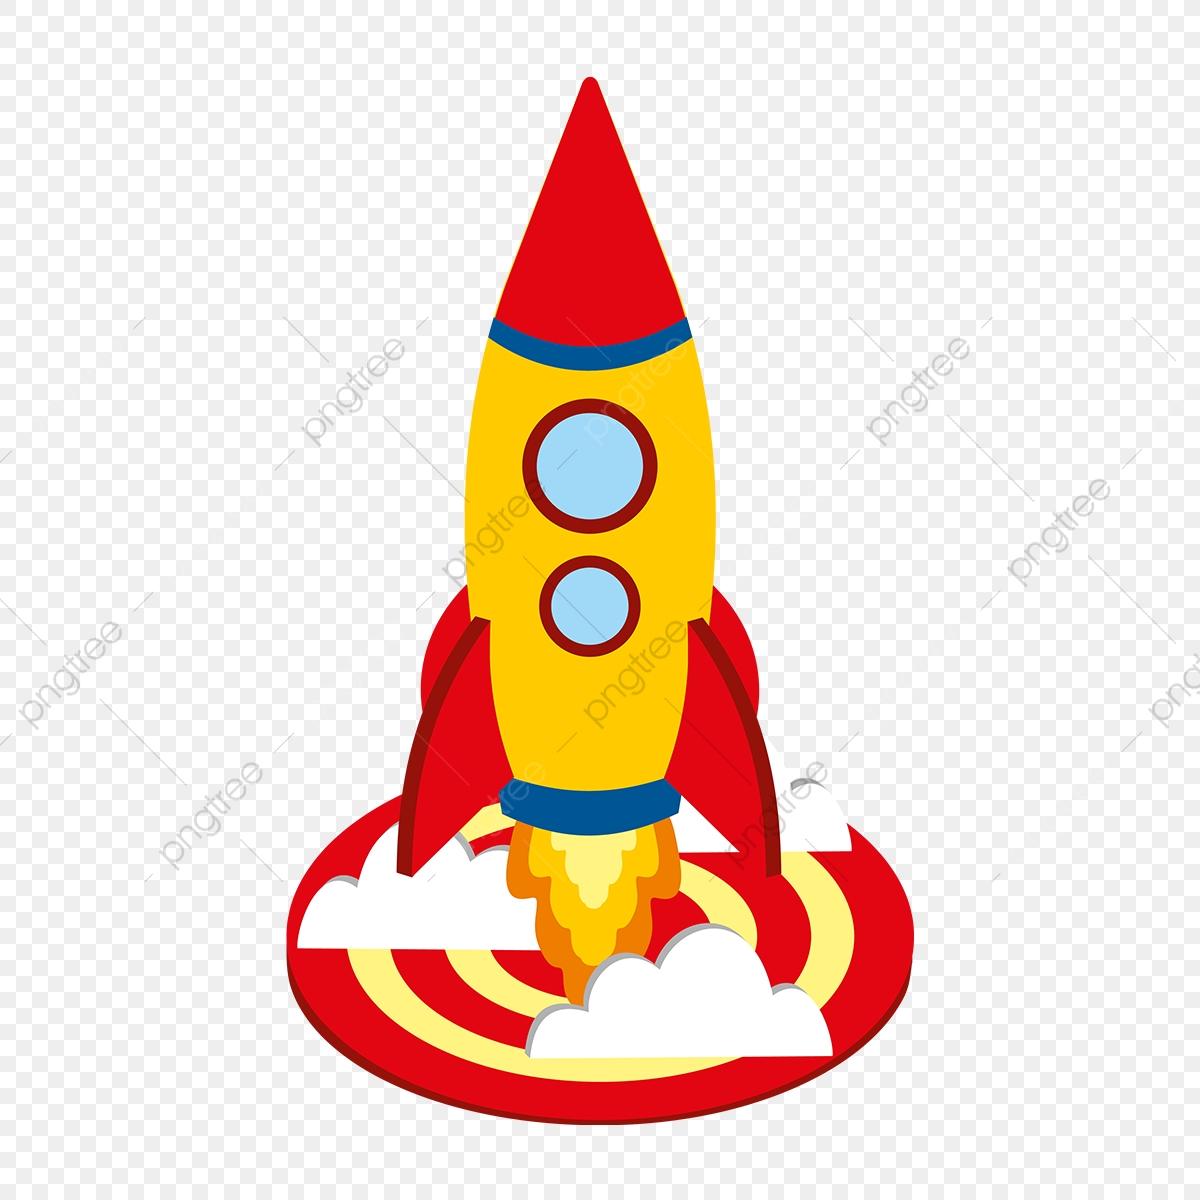 Startup Rocket Launch Illustration, Startup, Business.